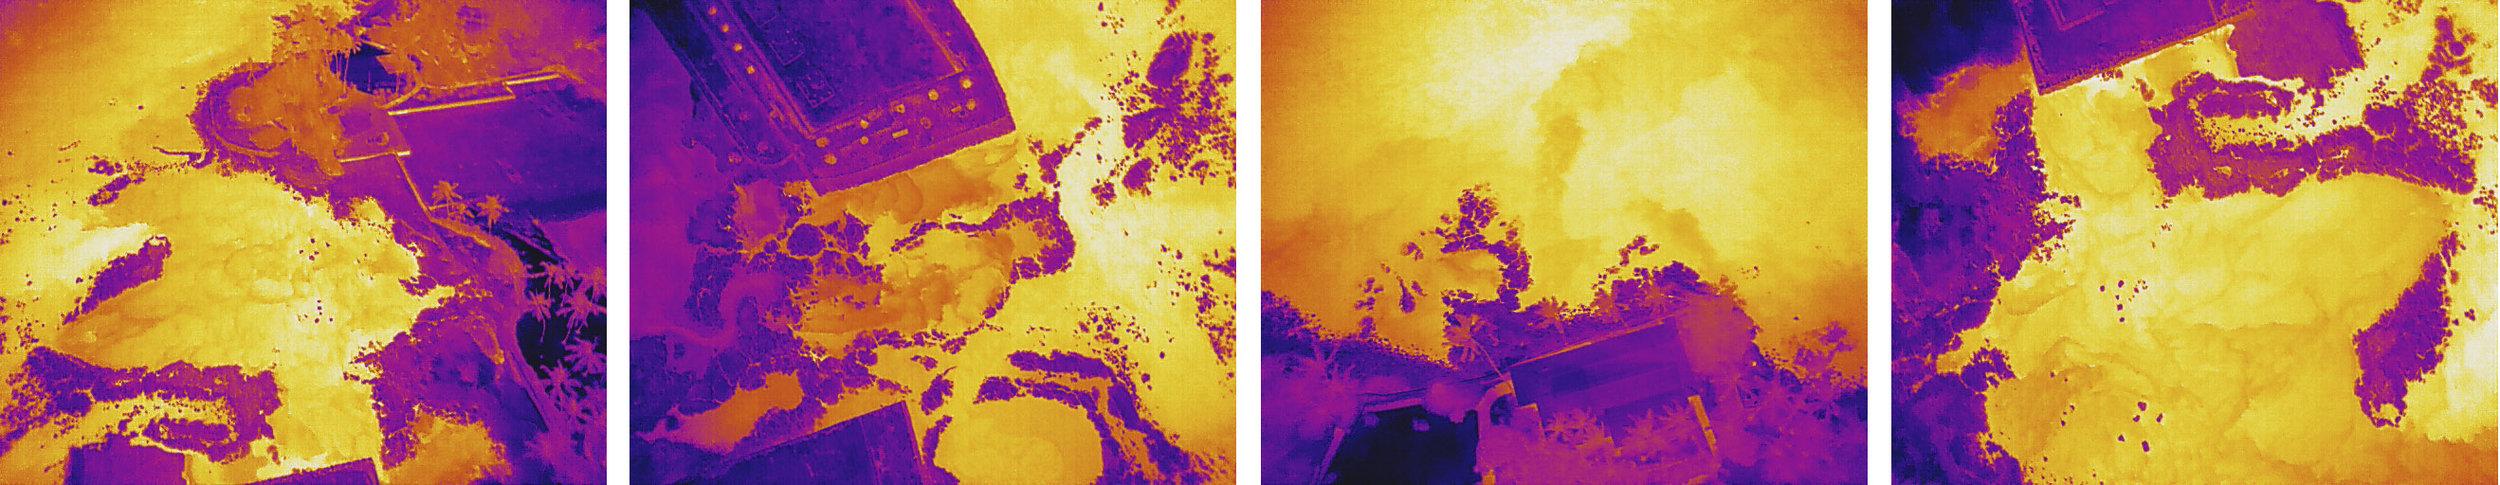 UH Thermal Kahalu'u Timo Collage 20190128-1.jpg